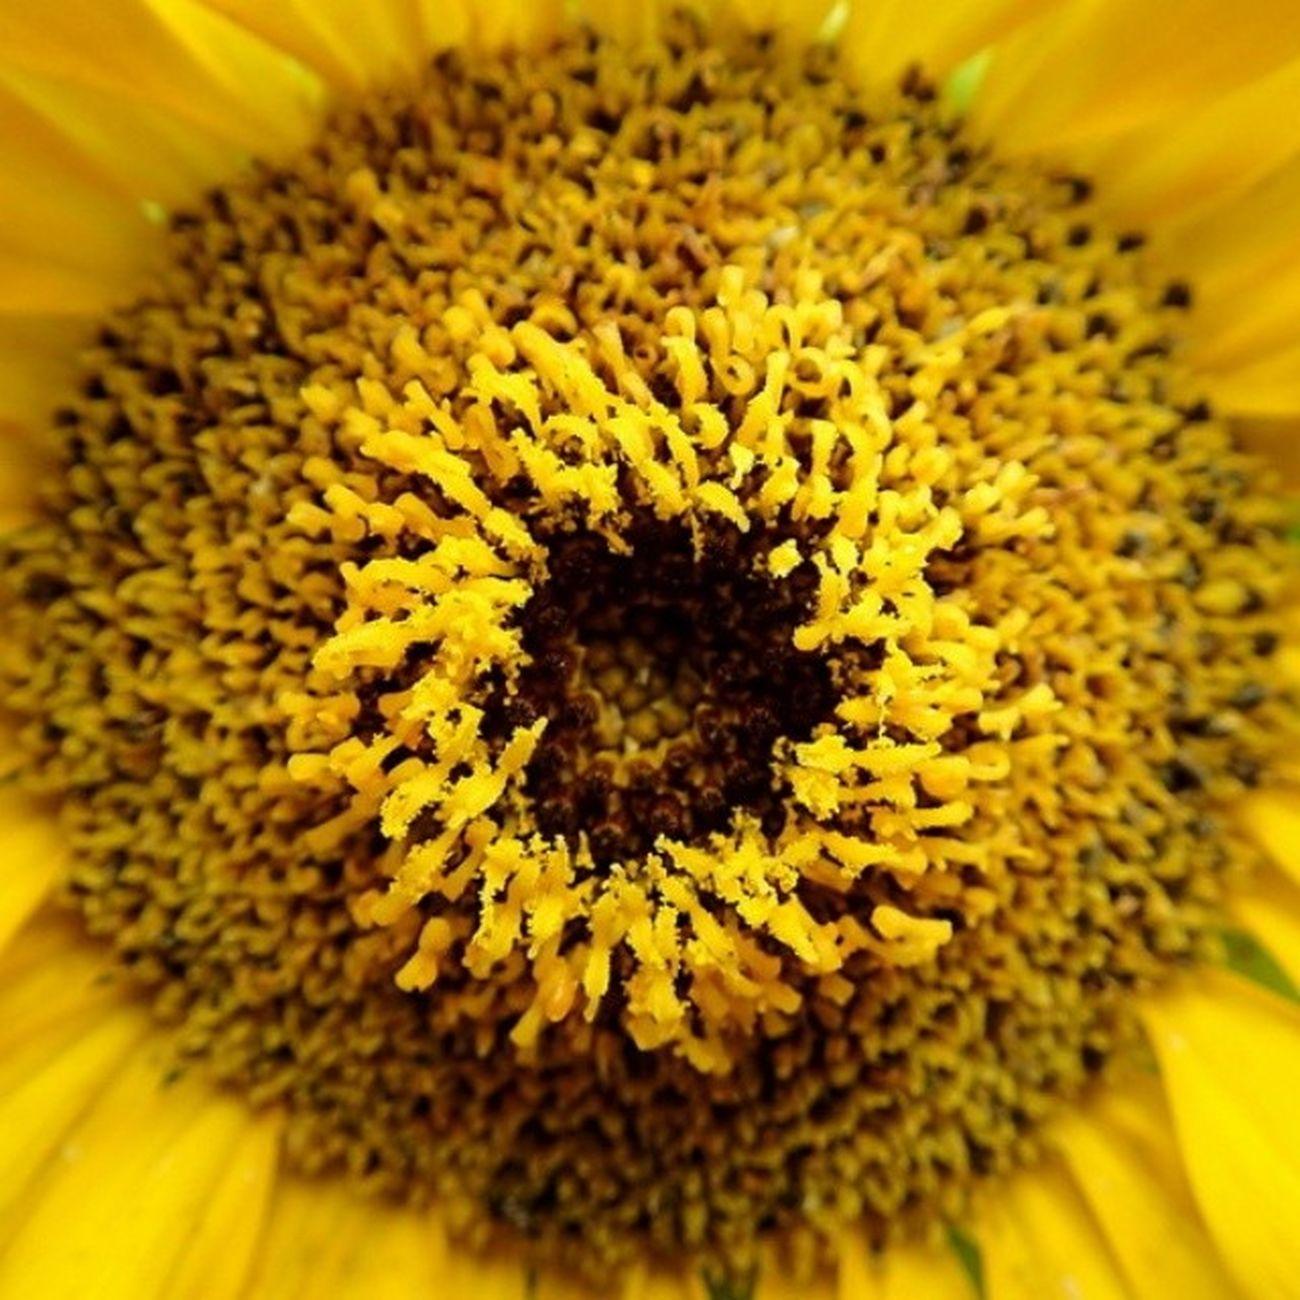 Macro Yellow Floral Naturelovers WeLoveNature  Flowerlovers Floral_lover Flowers Nature Flower Flora